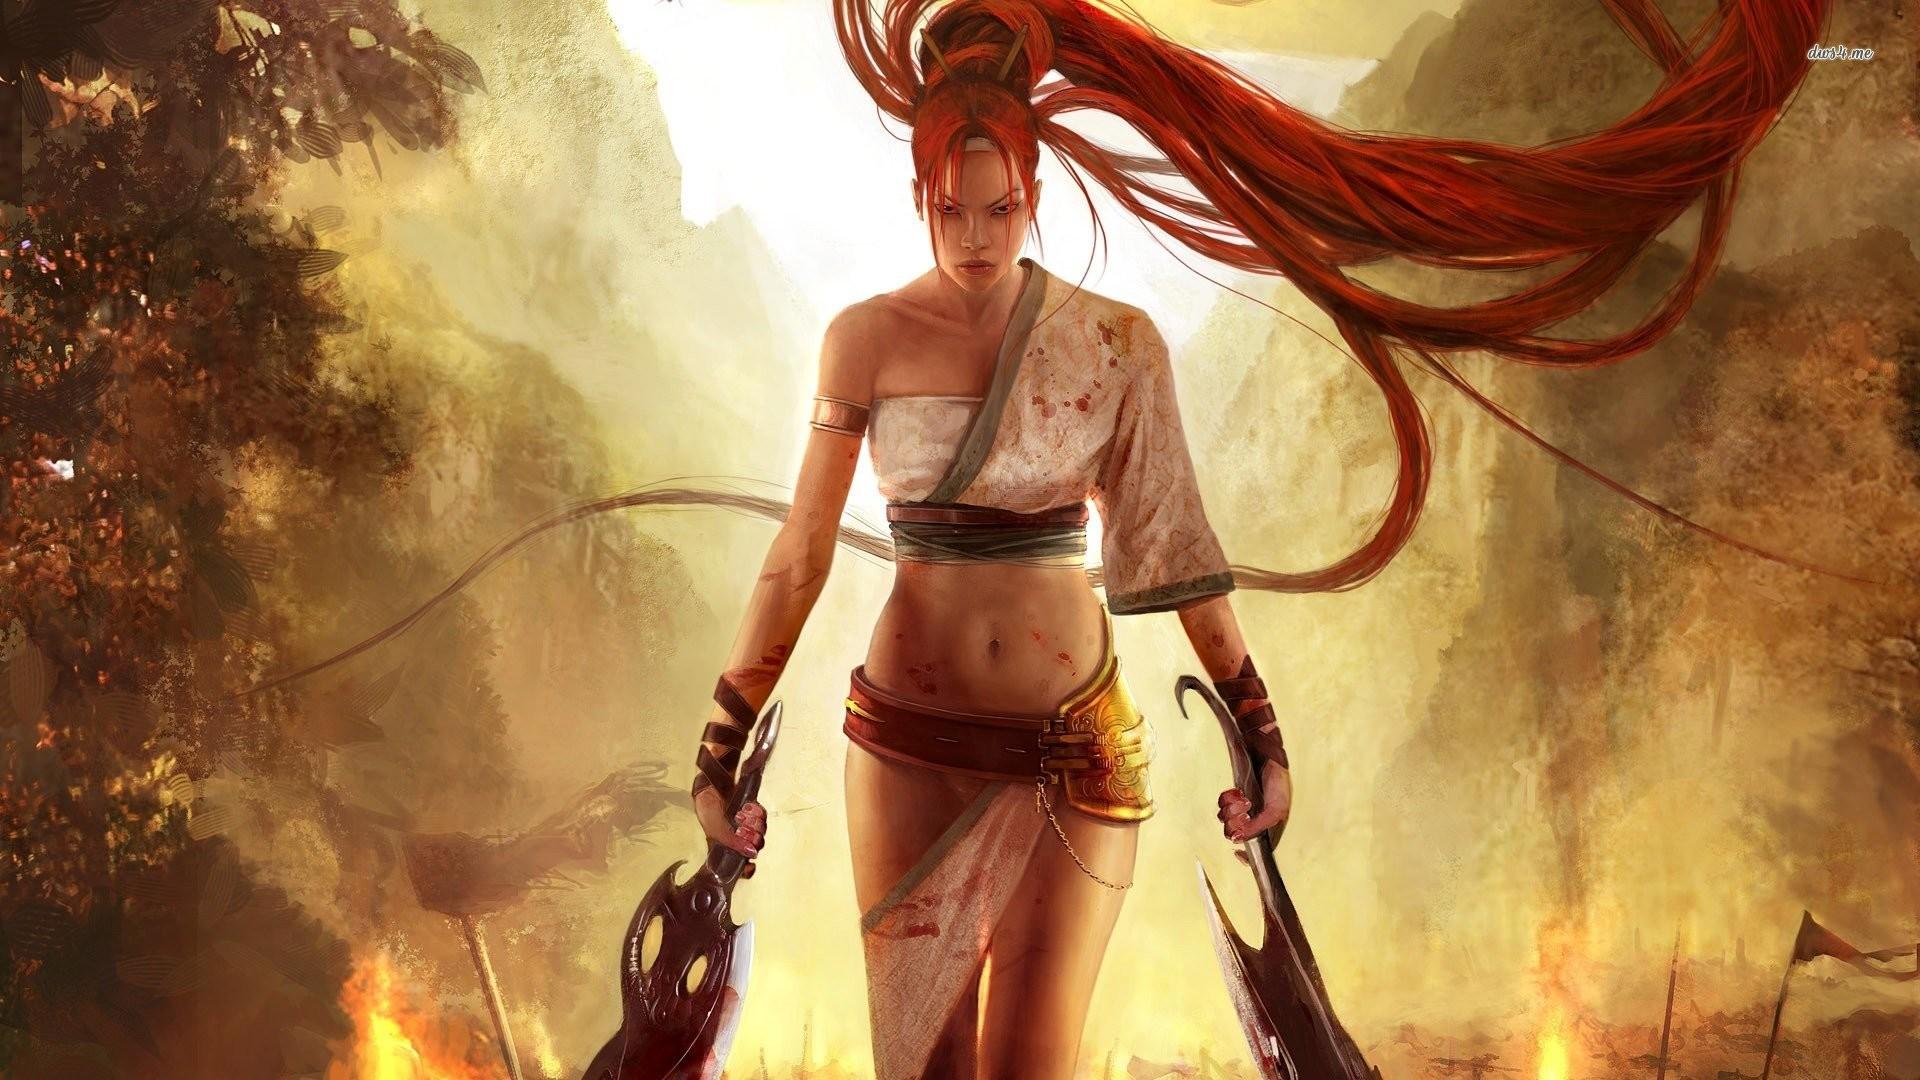 Woman Gladiator 325149